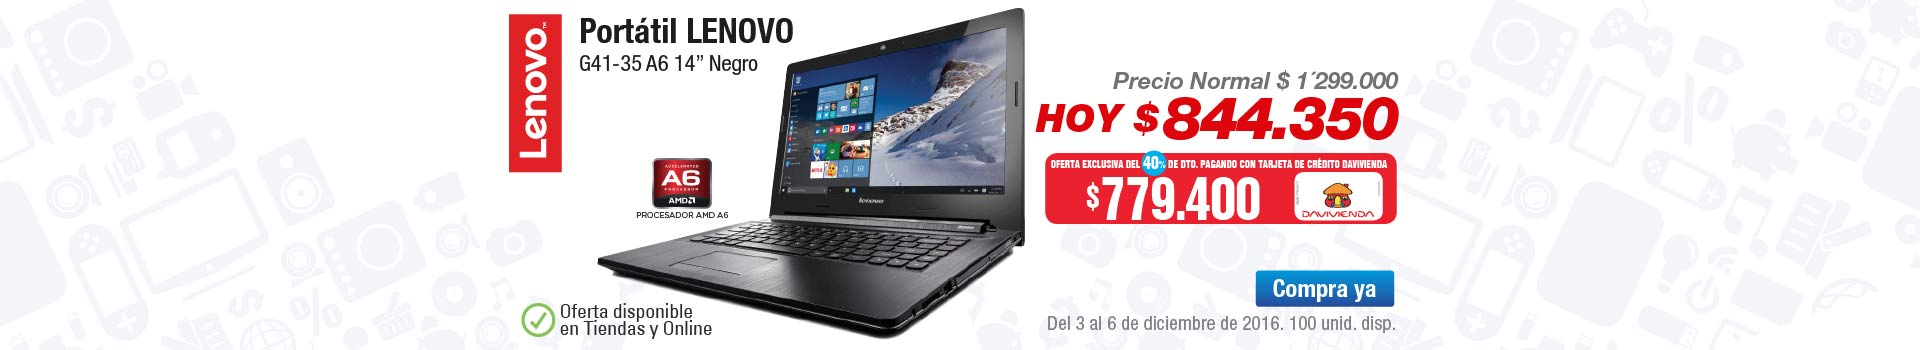 "Oferta Computadores y Tablets - diciembre 3 - Portátil LENOVO G41-35 A6 14"" Negro"